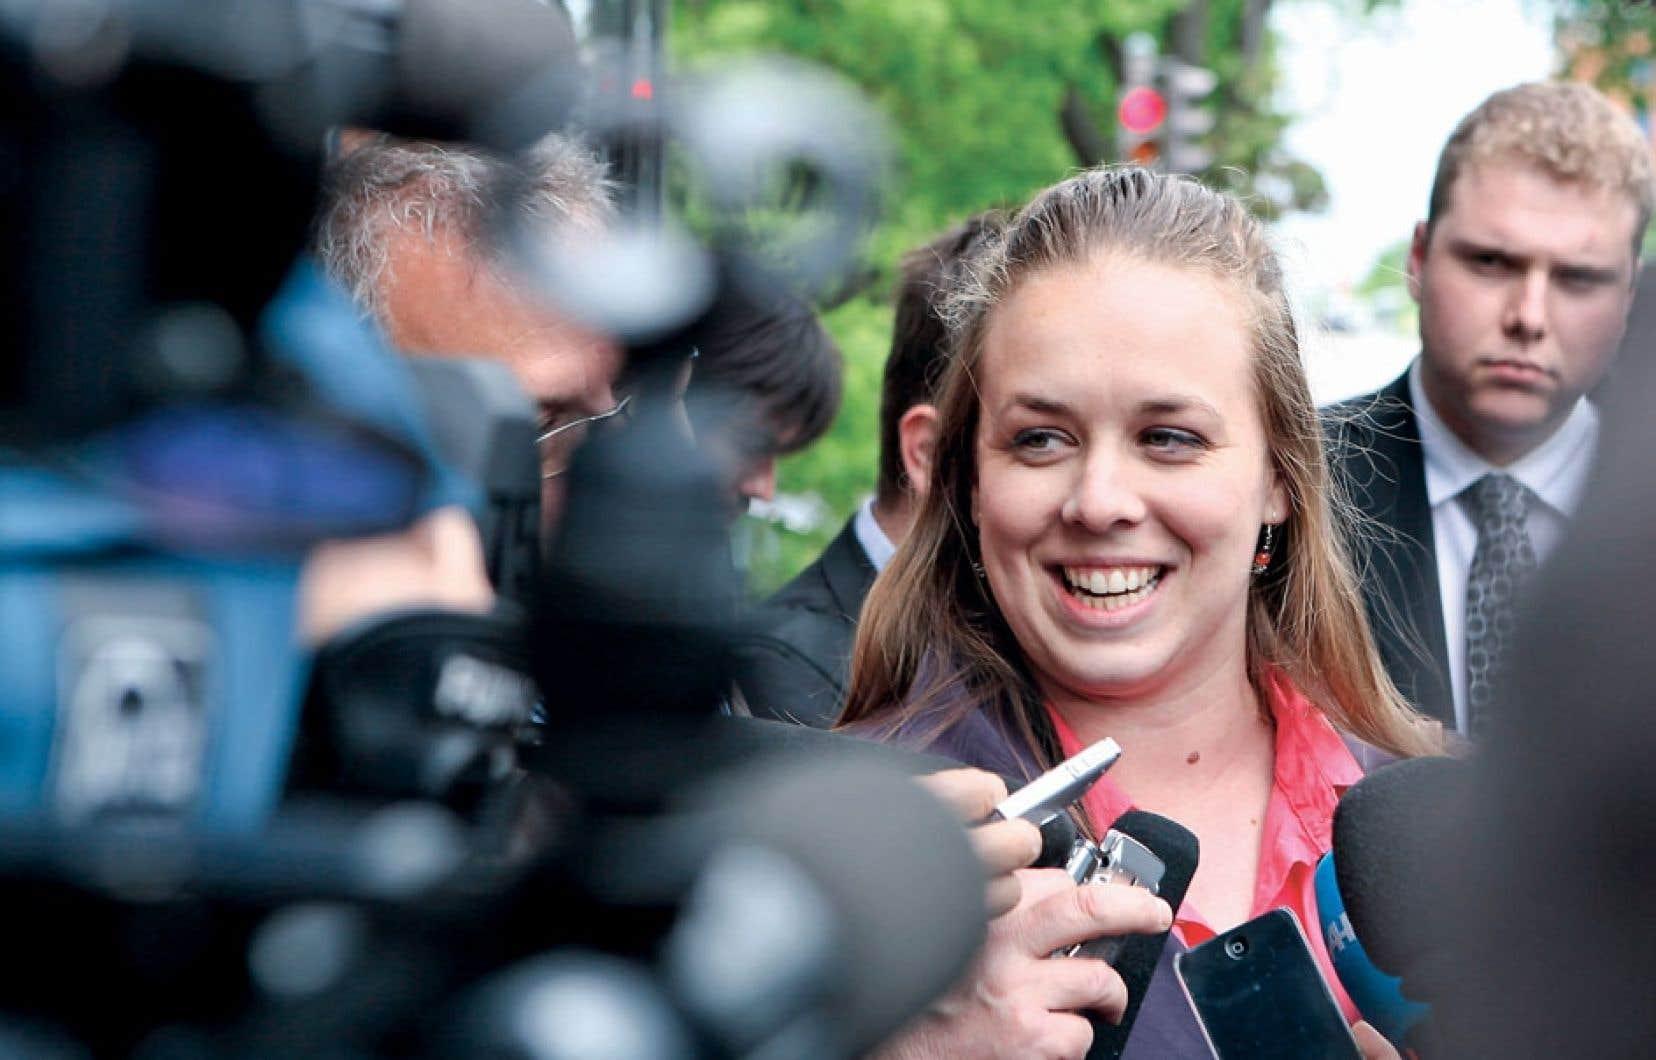 Le mandat de Martine Desjardins à la tête de la FEUQ prendra fin le 30avril.